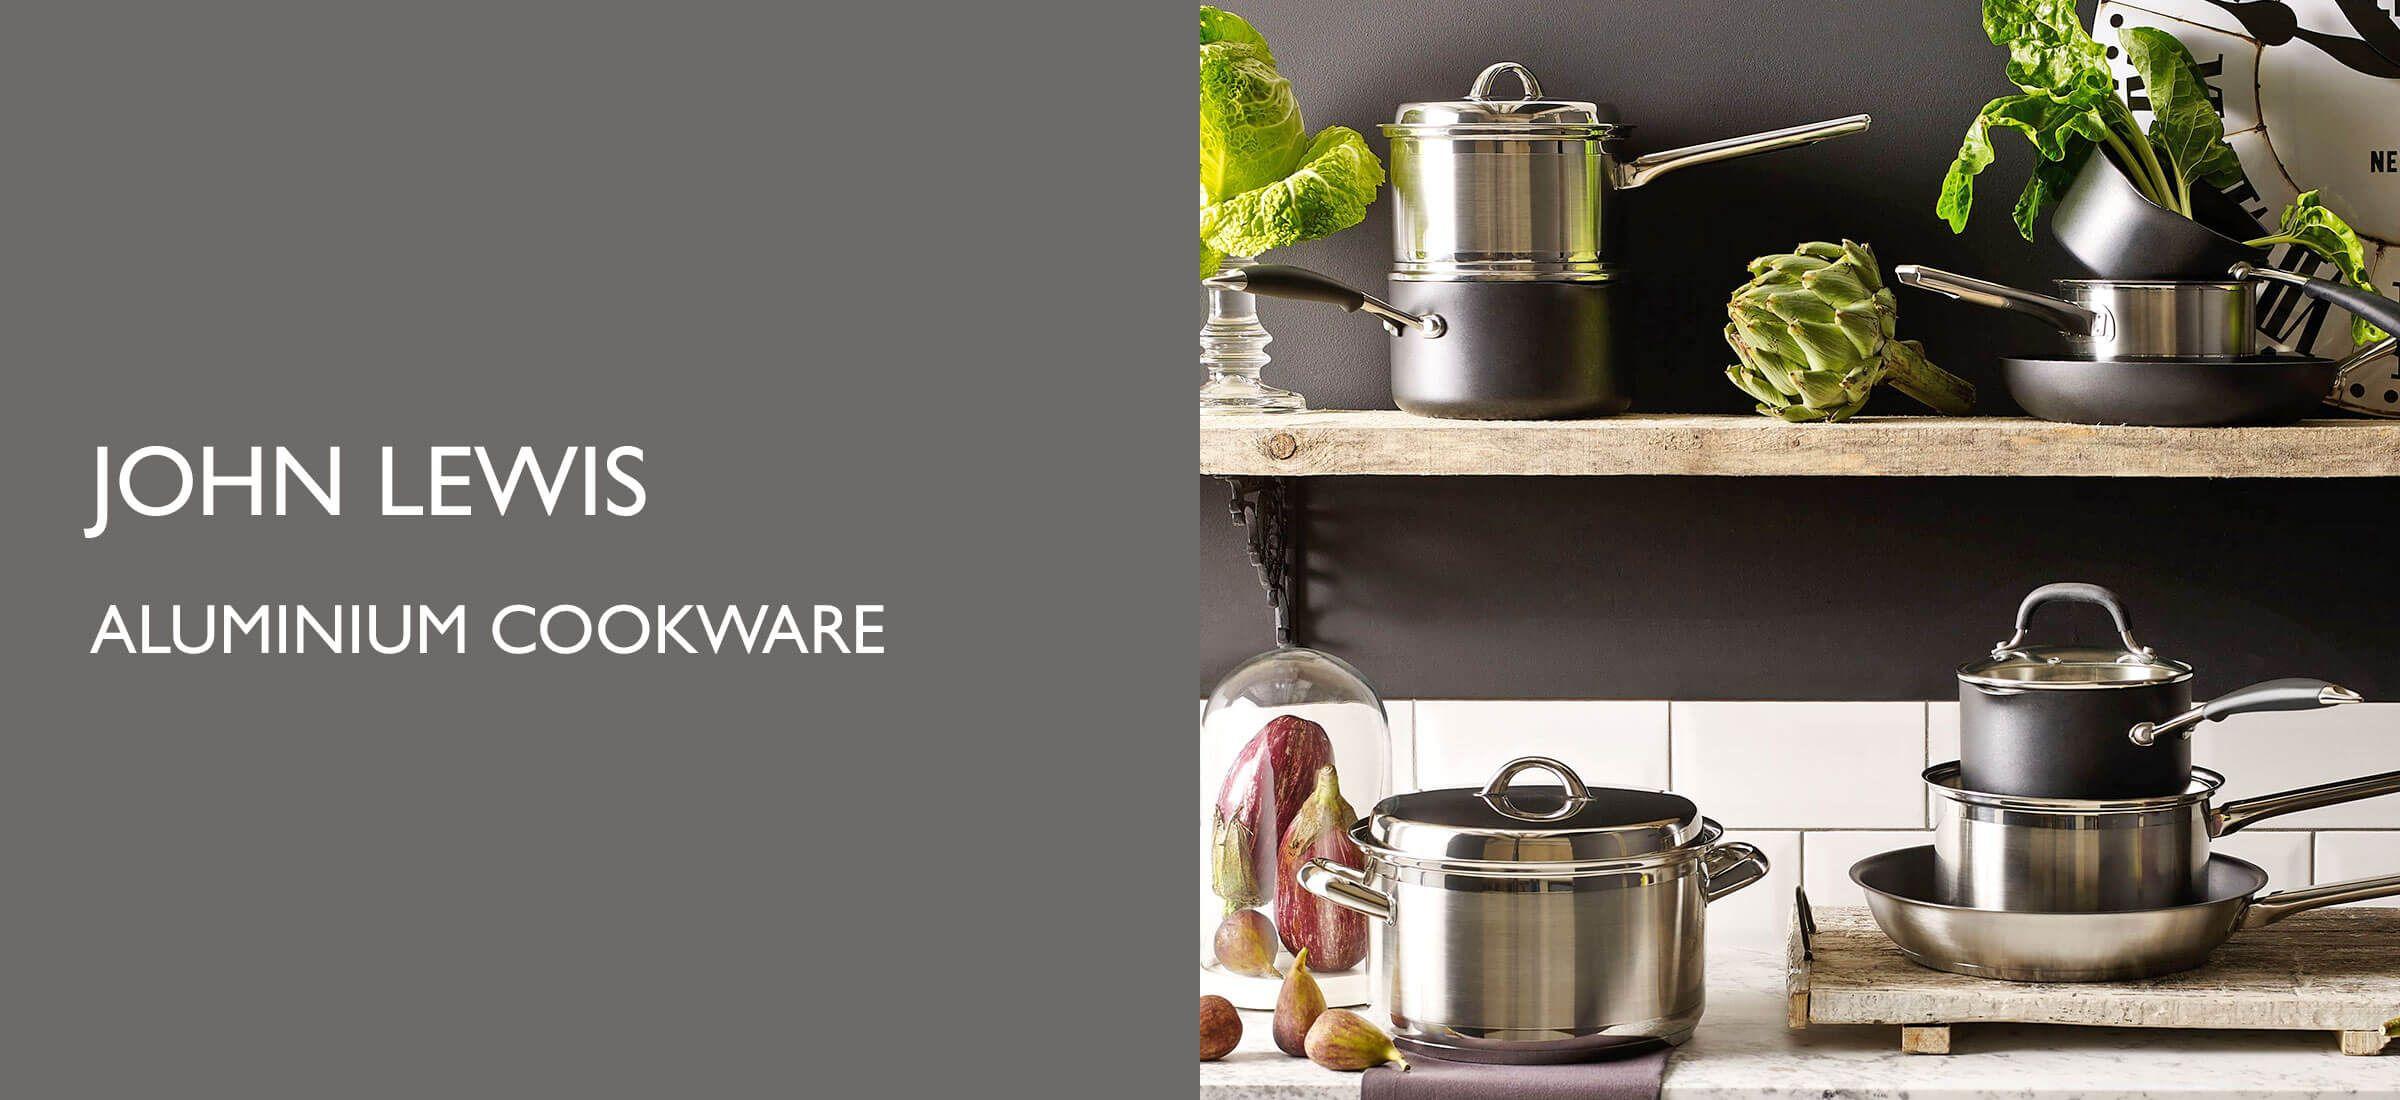 Cookware  Pans, Utensils, Bread Bins, Scales & Knives  John